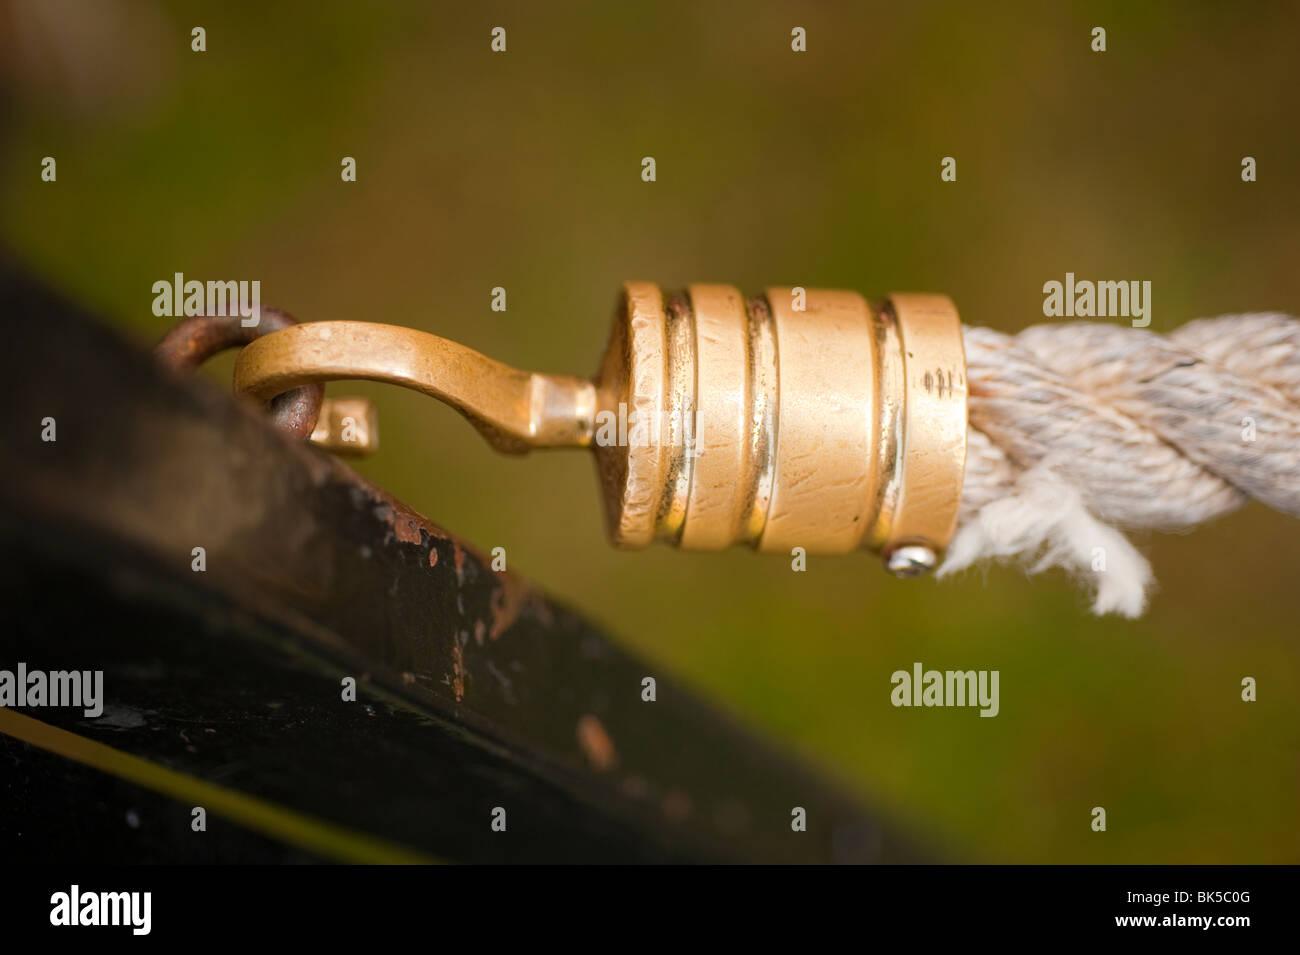 Brass ferrule on end of rope Stock Photo